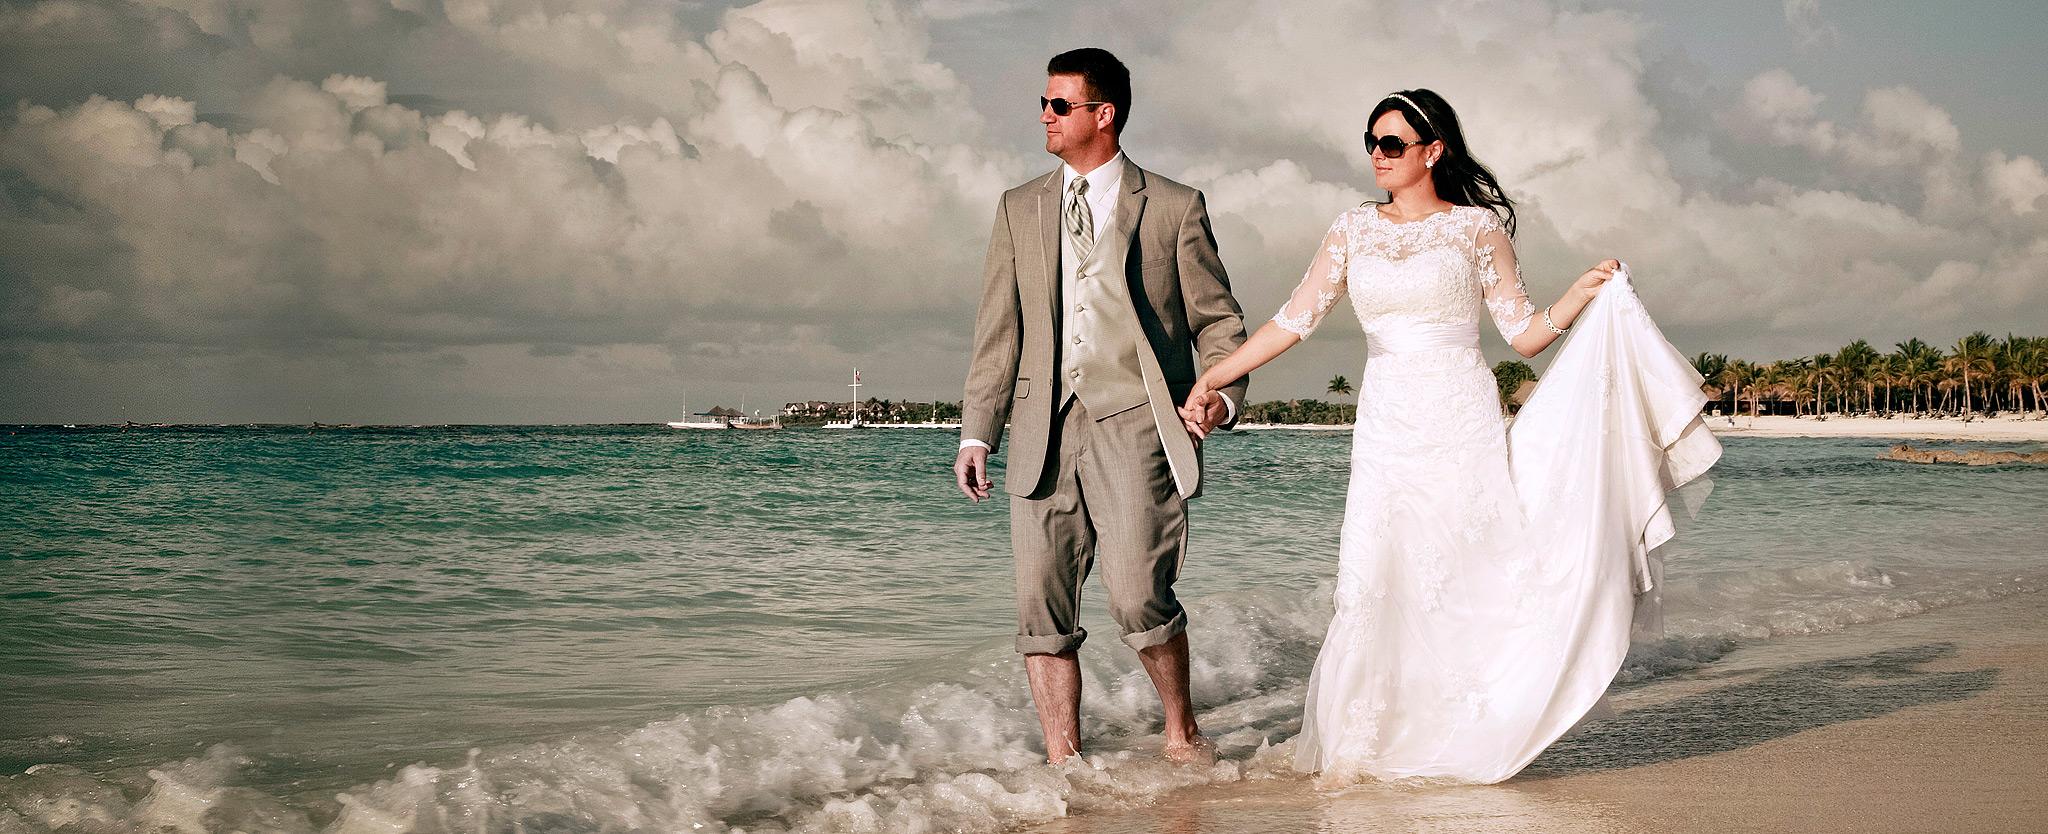 photographe-mariage-riviera-maya-mexique-stephane-lariviere-photo-photographie-rigaud